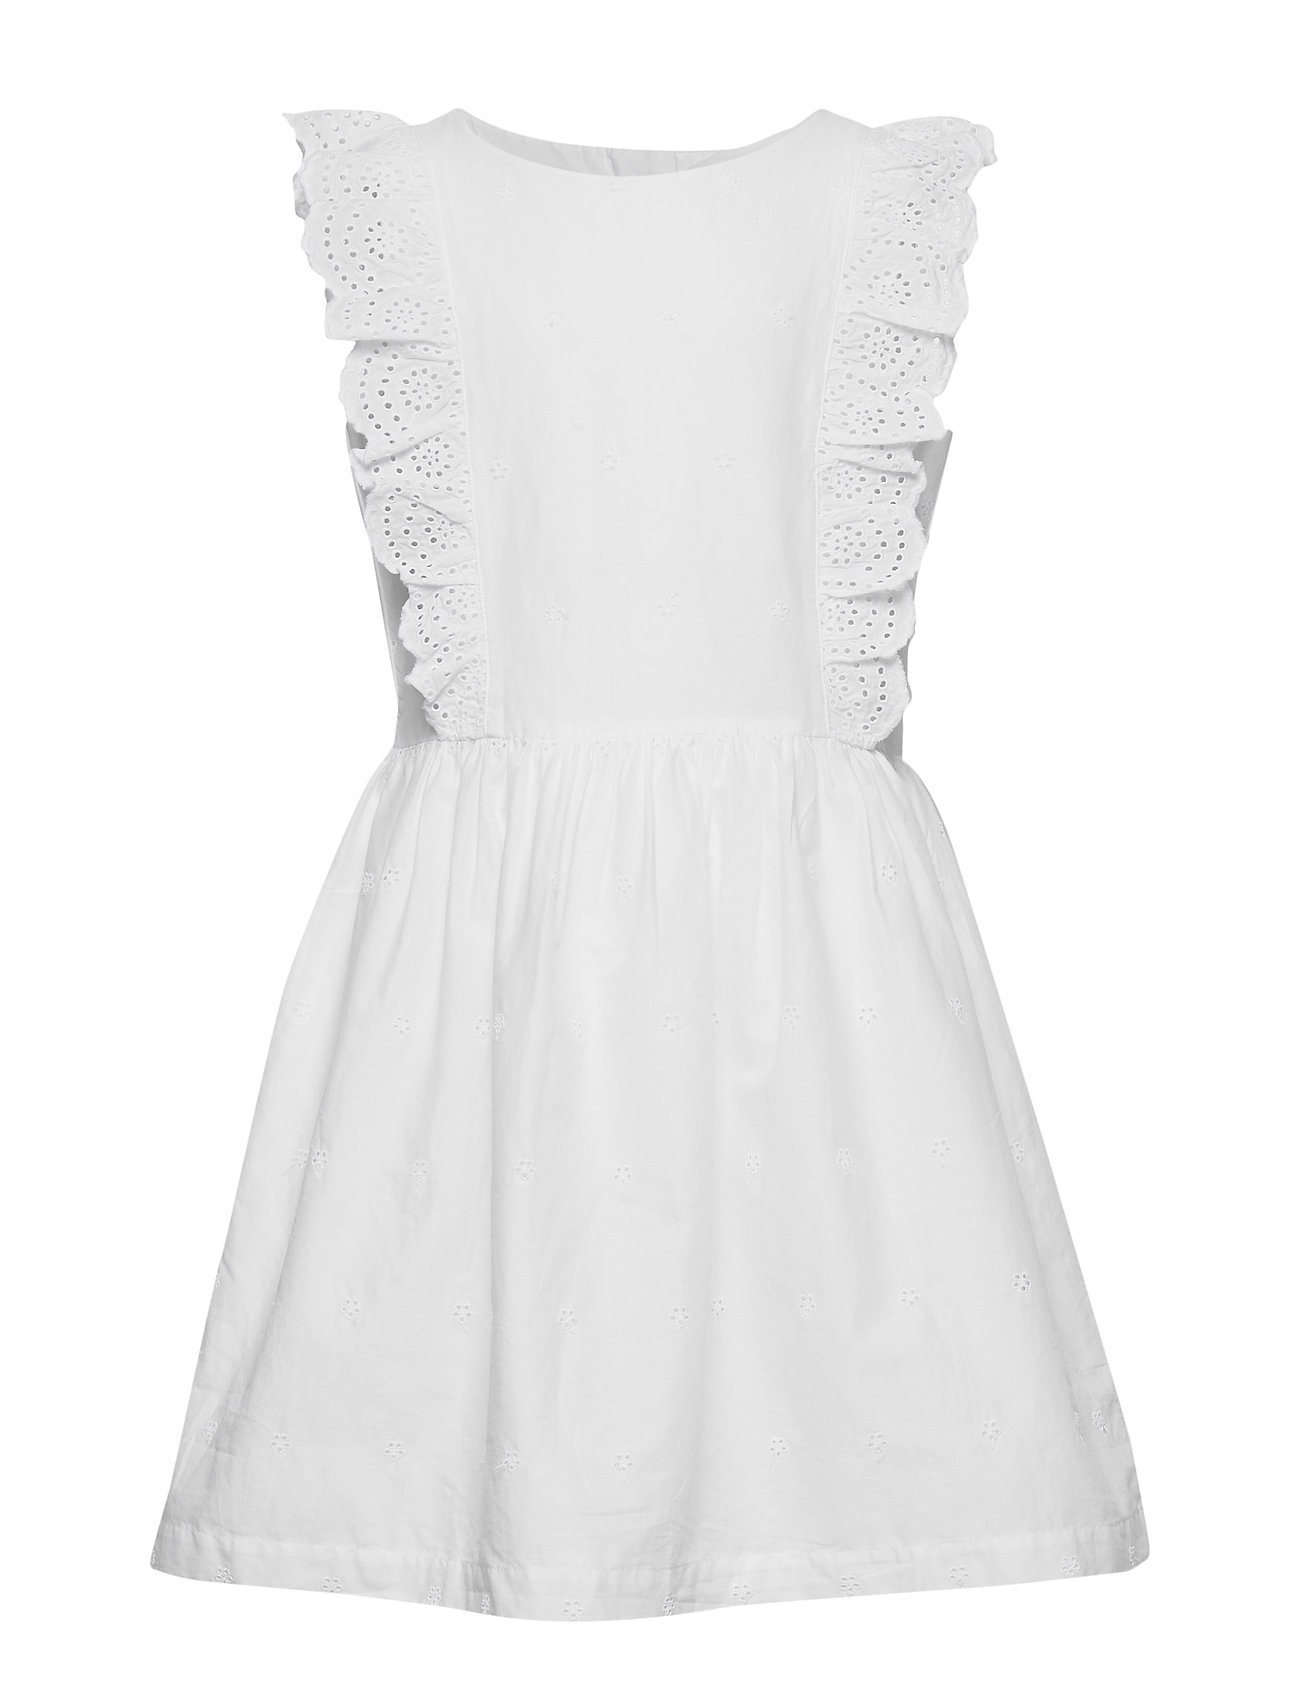 GAP Kids Eyelet Ruffle Dress - OPTIC WHITE 3